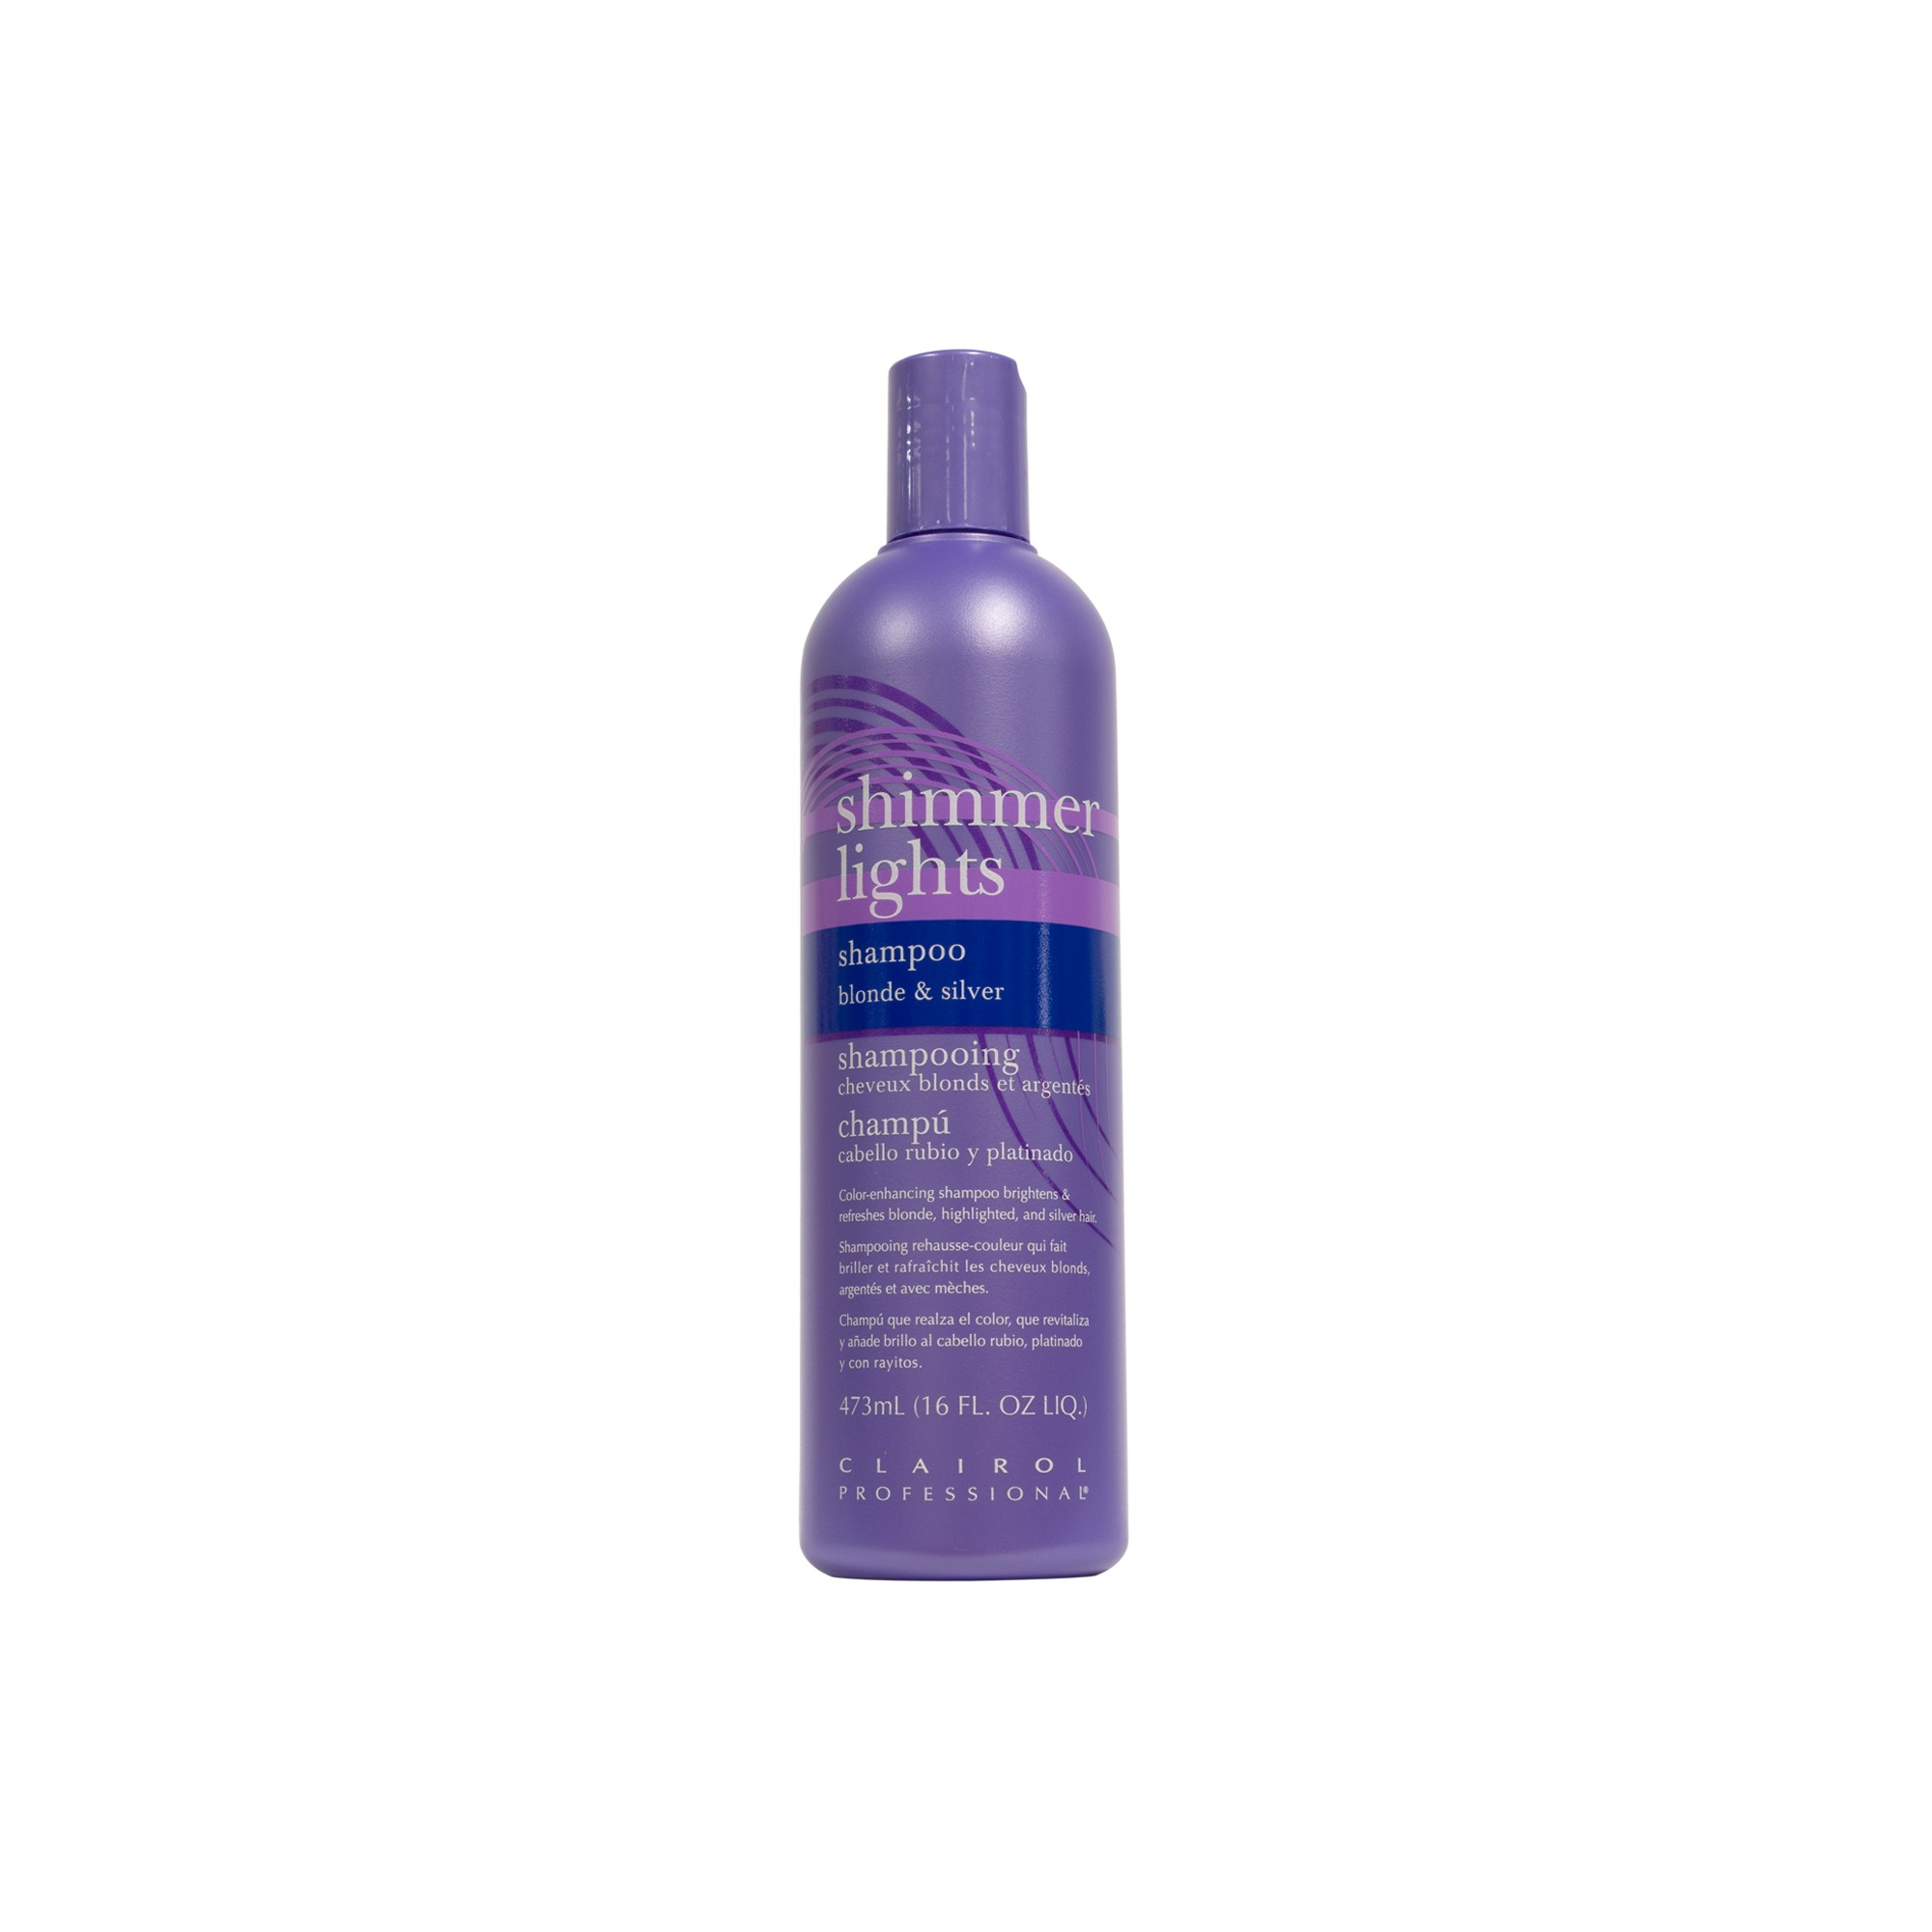 Clairol Professional Shimmer Lights Shampoo 16 Fl Oz Adult Unisex Shimmer Lights Shampoo Shimmer Lights Light Blonde